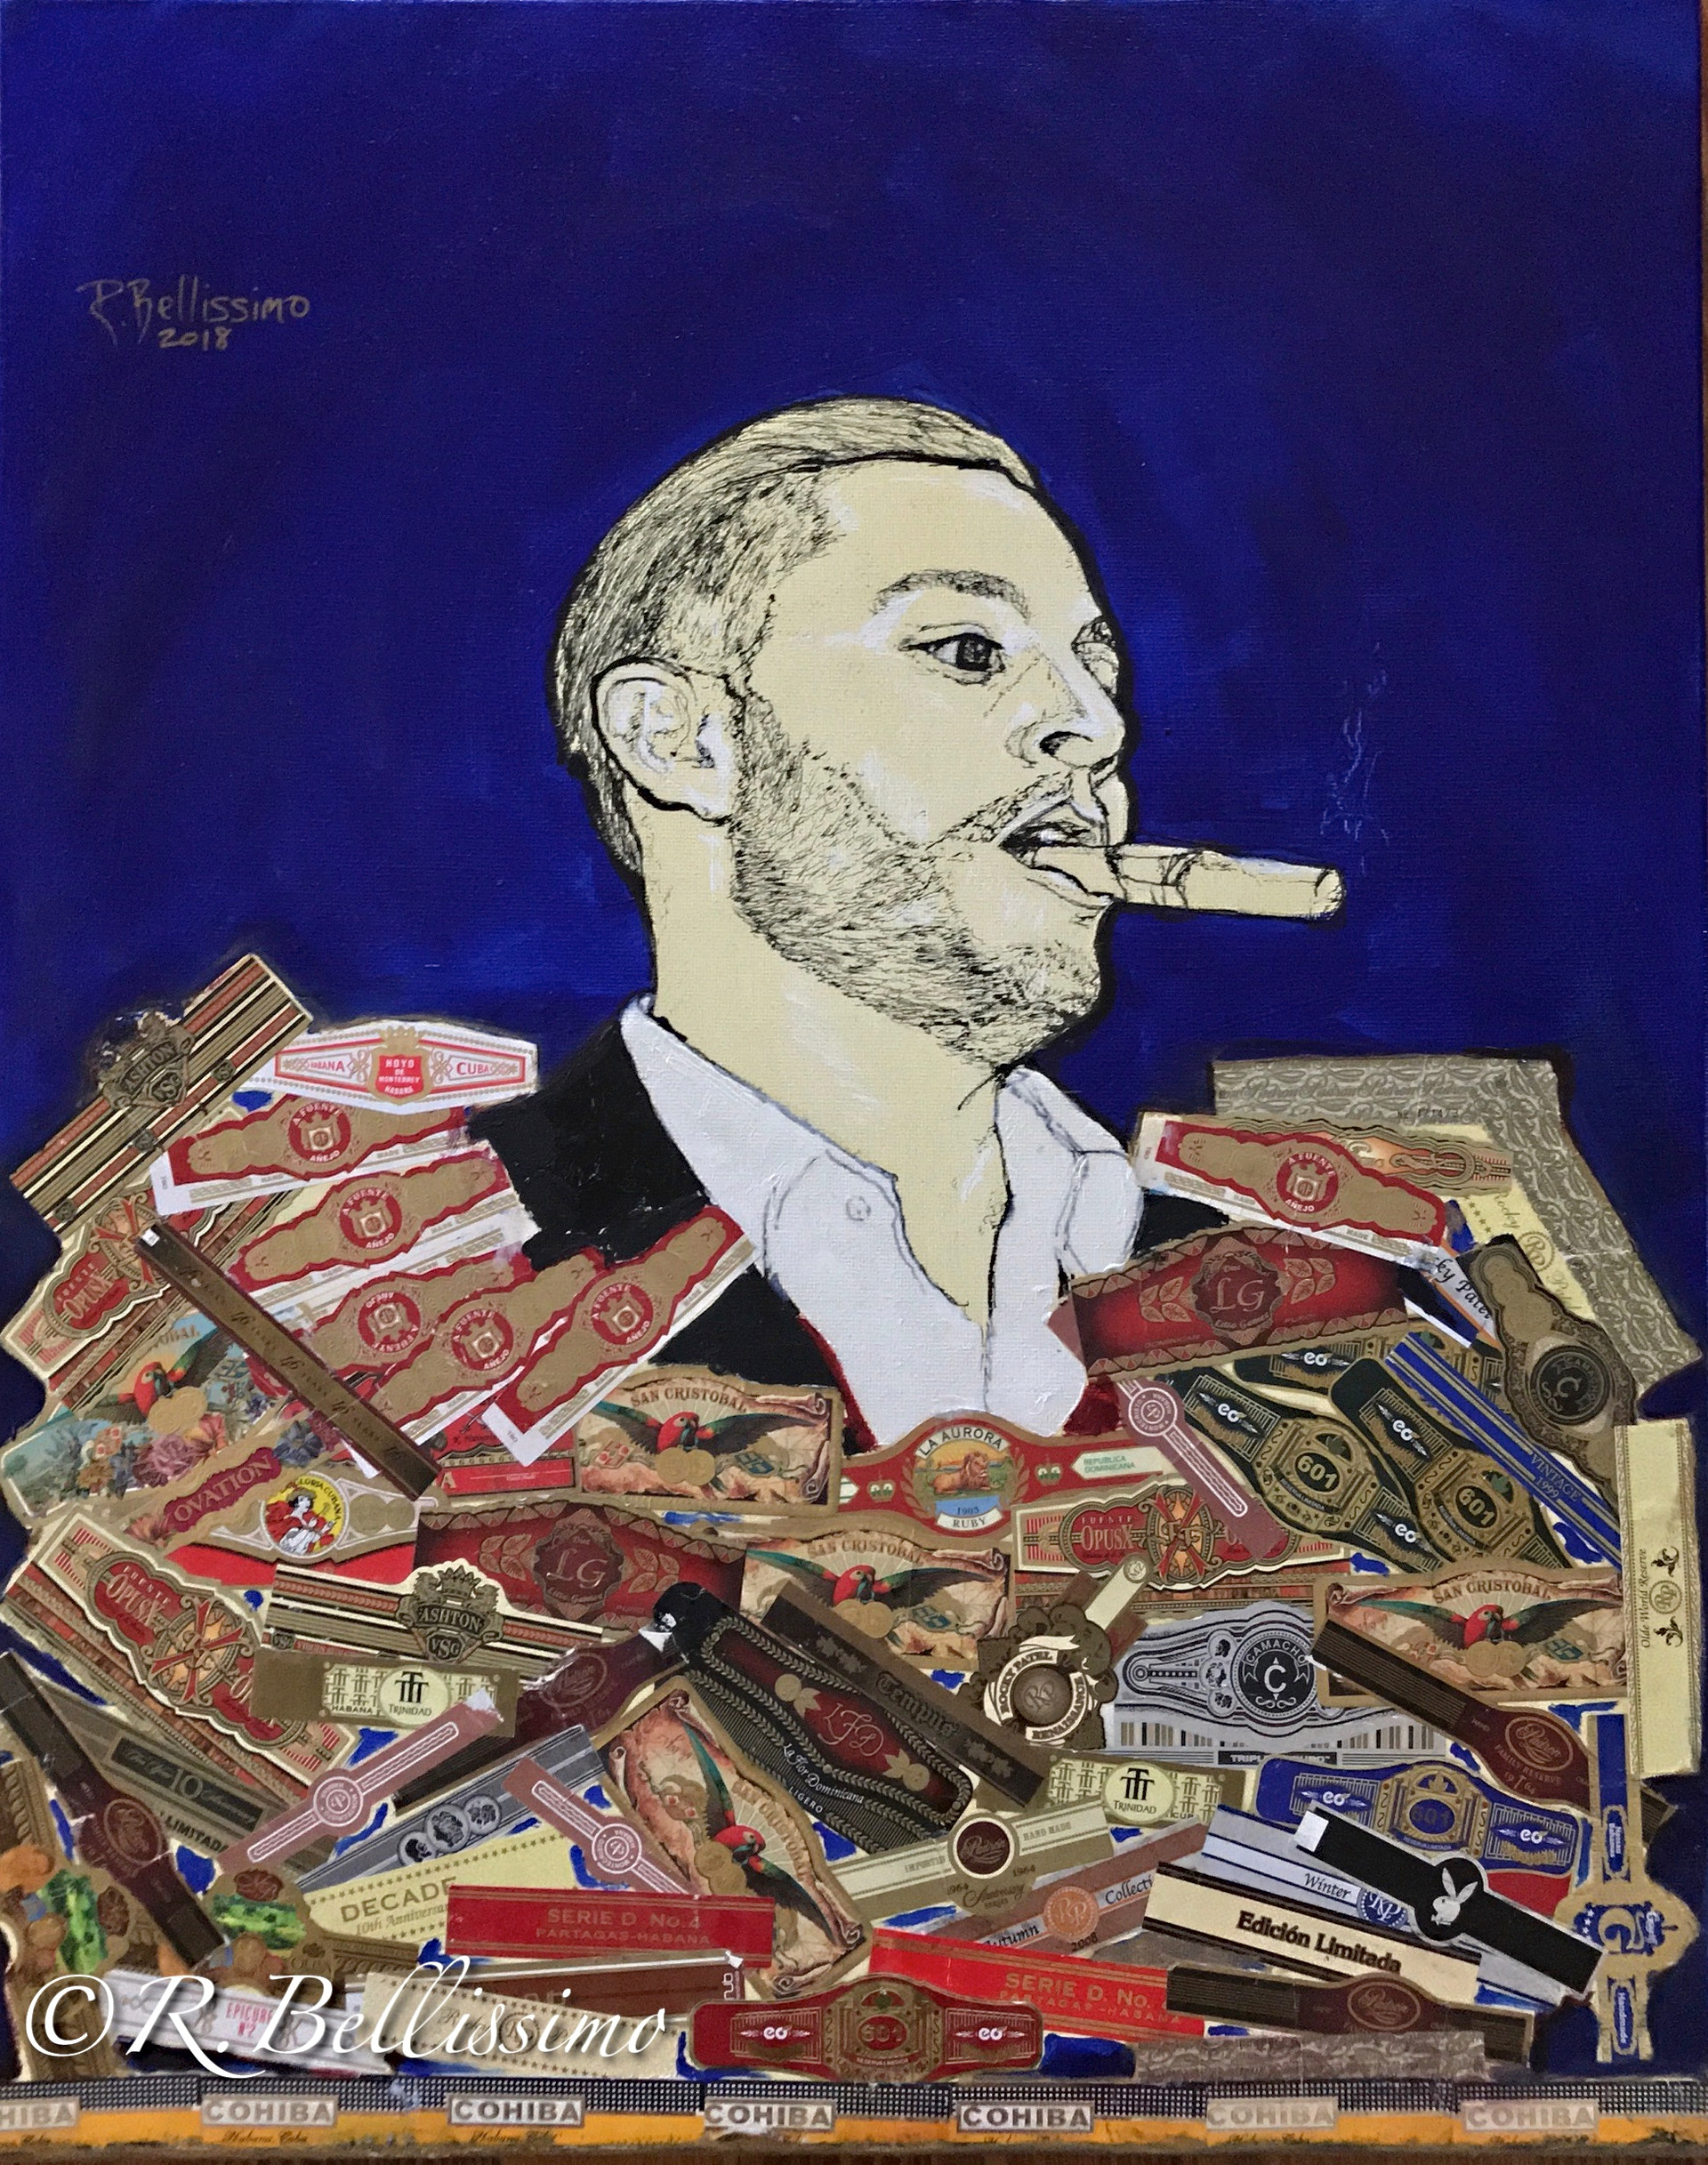 Cigar Ban